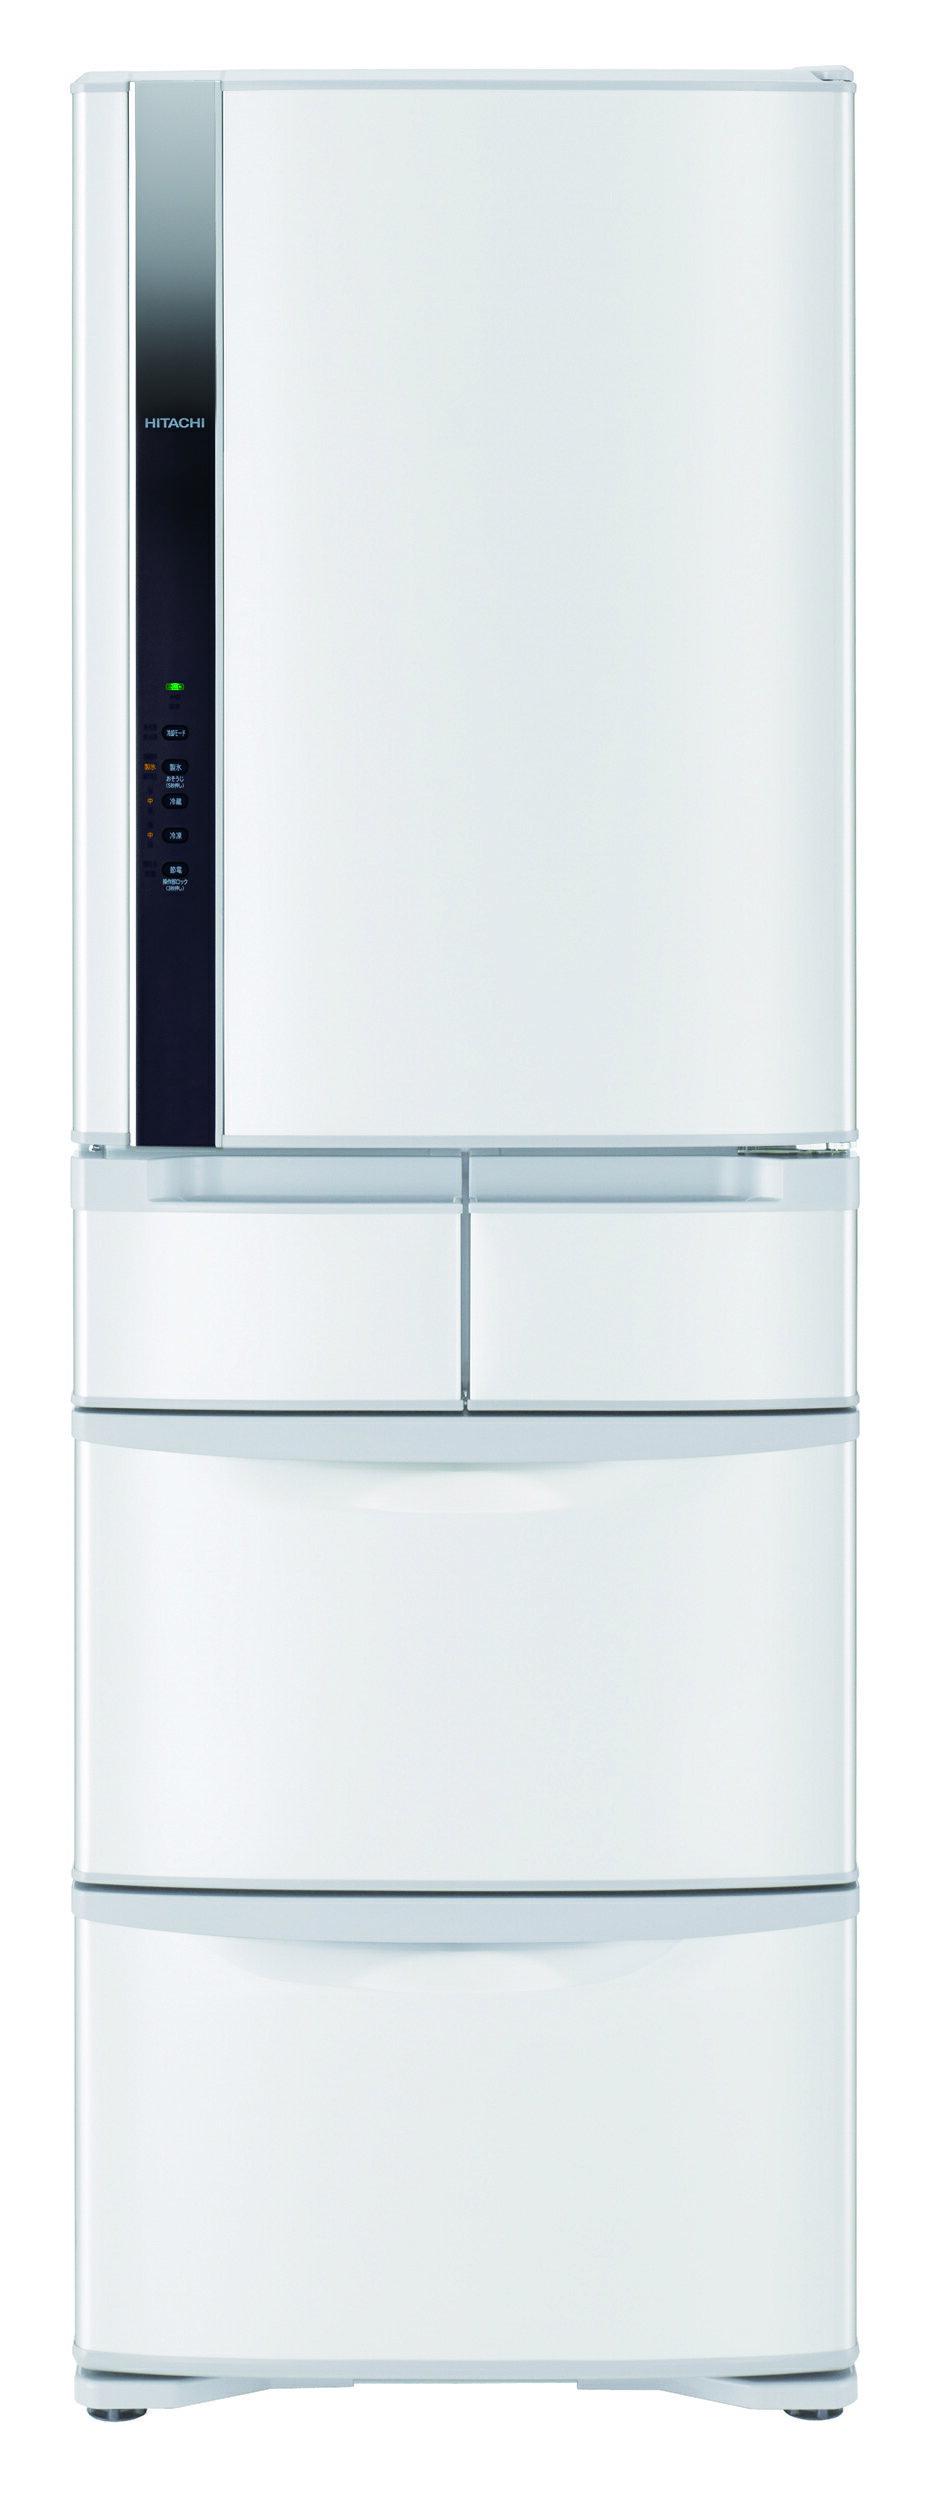 【HITACHI日立】日本原裝變頻420L。五門電冰箱/星燦白(RS42FJ)